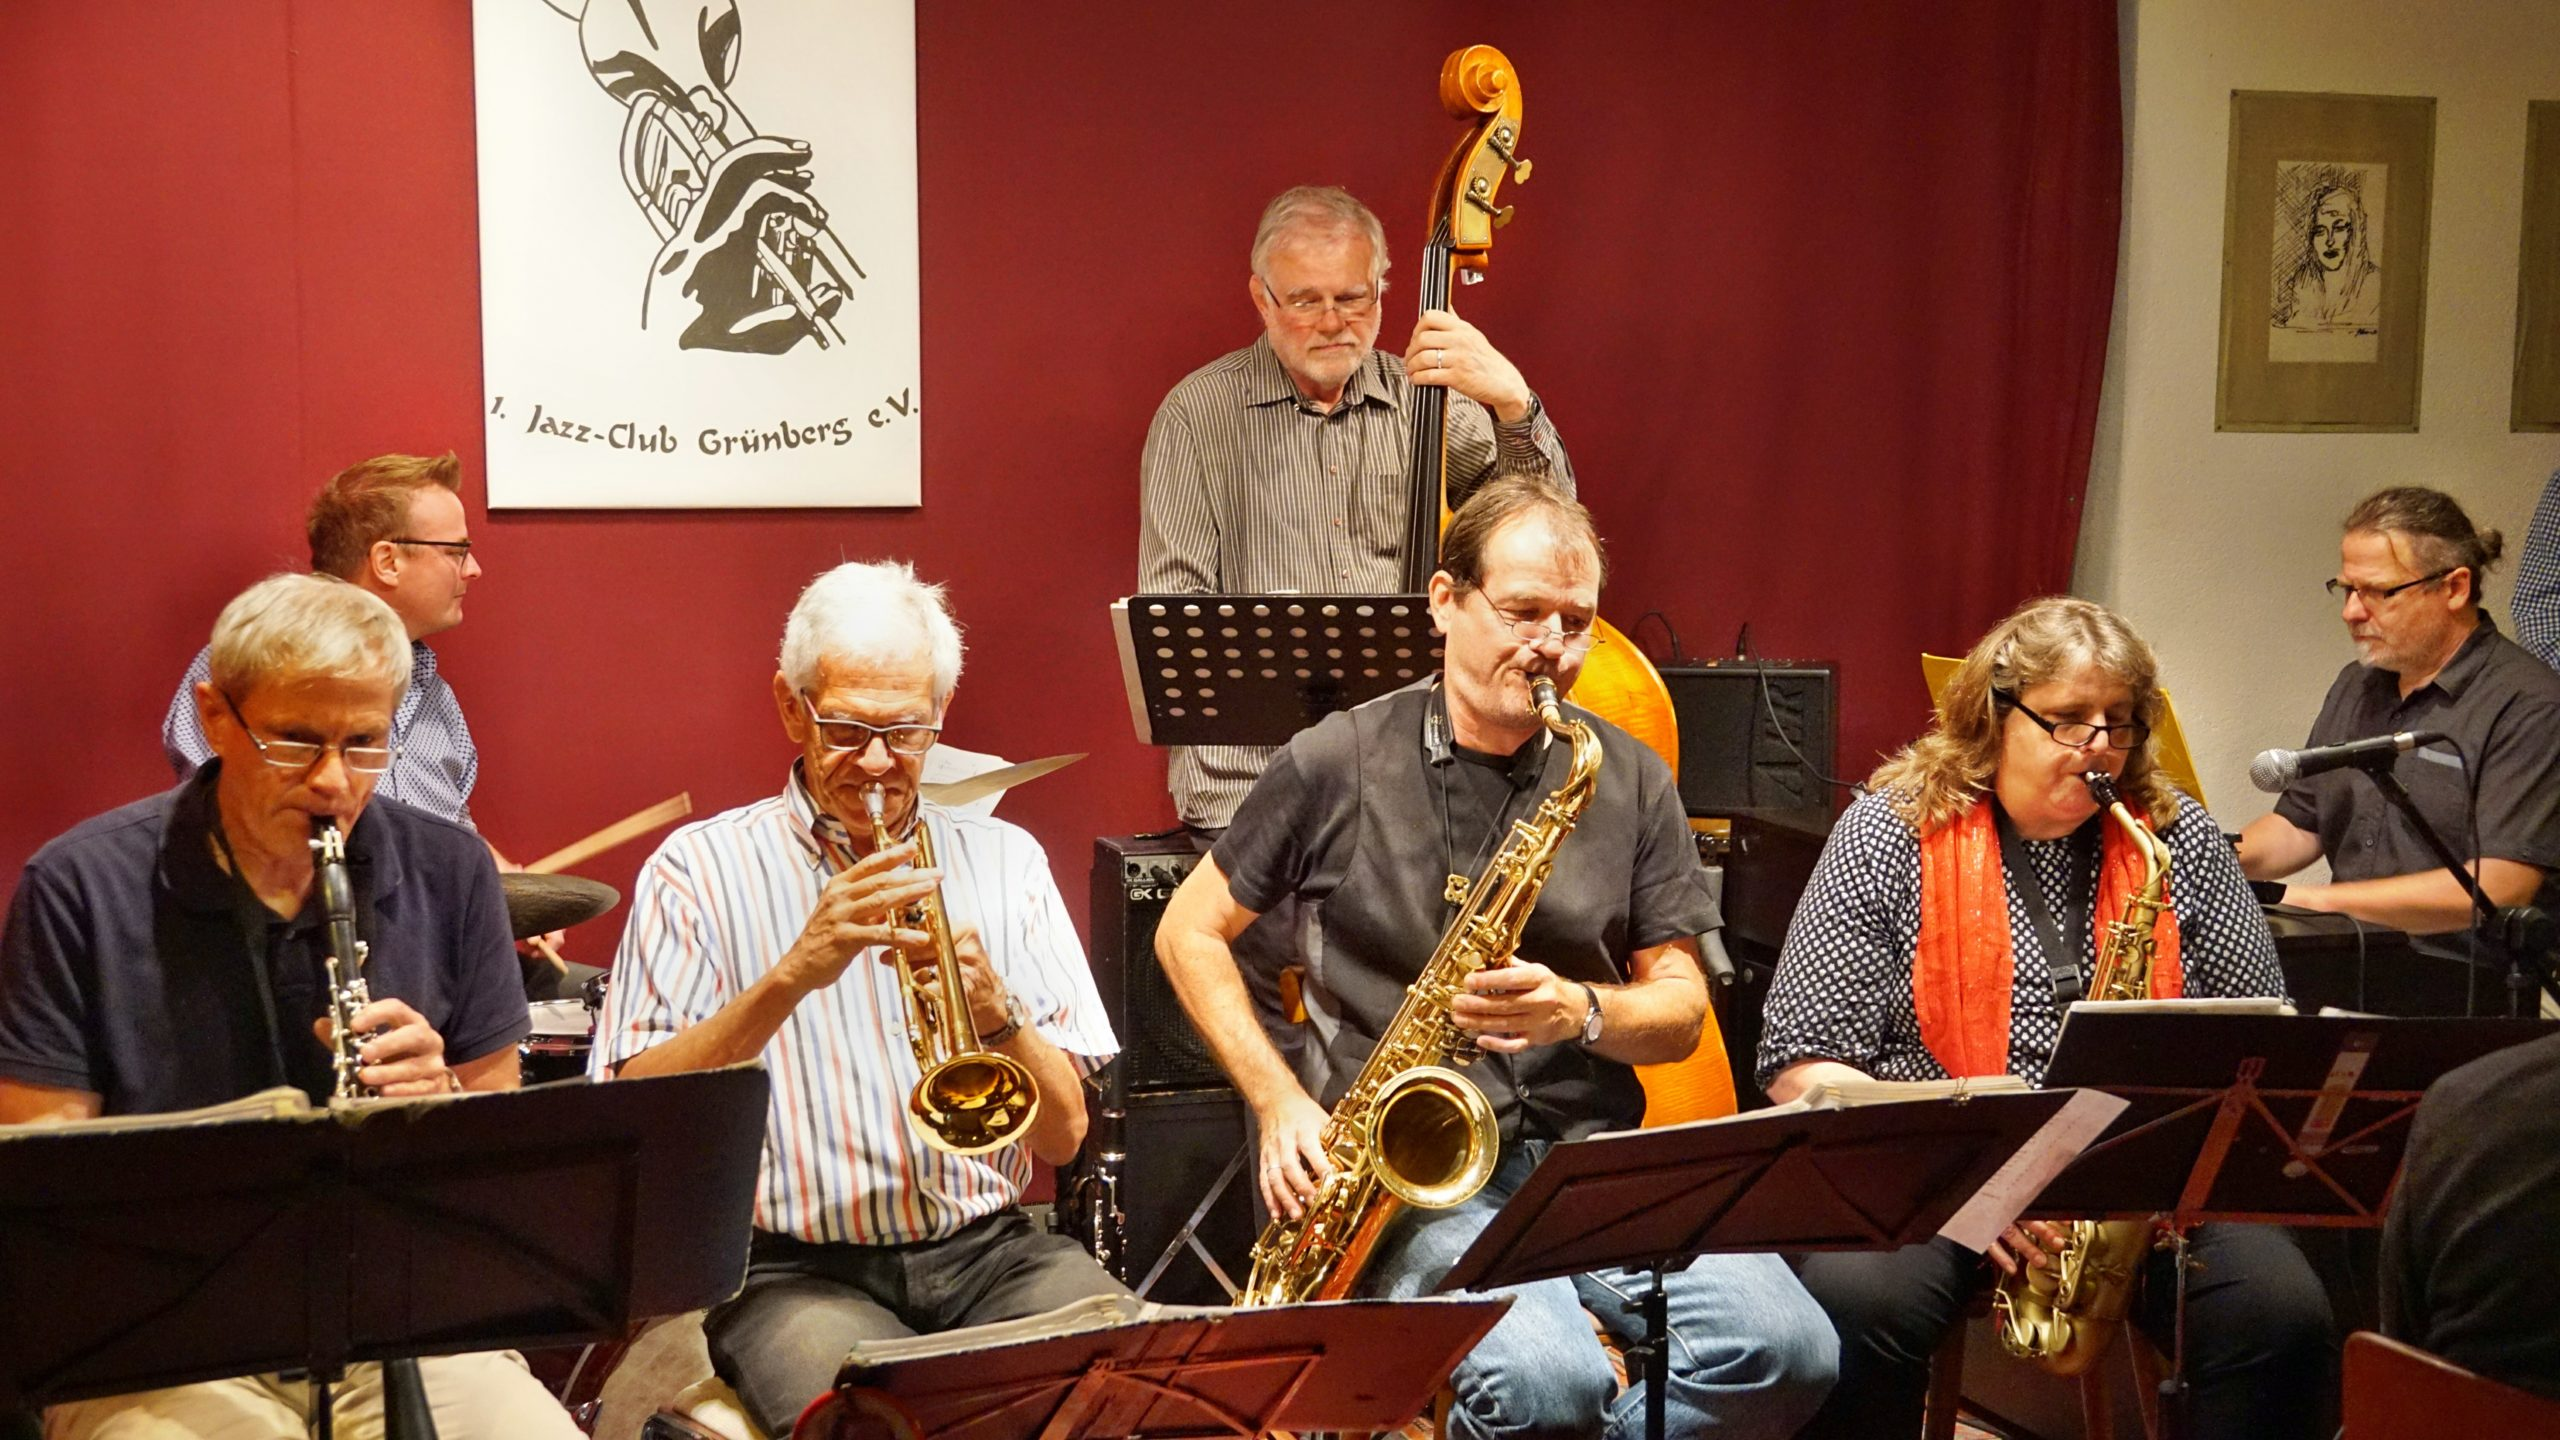 Leathertown Jazzband